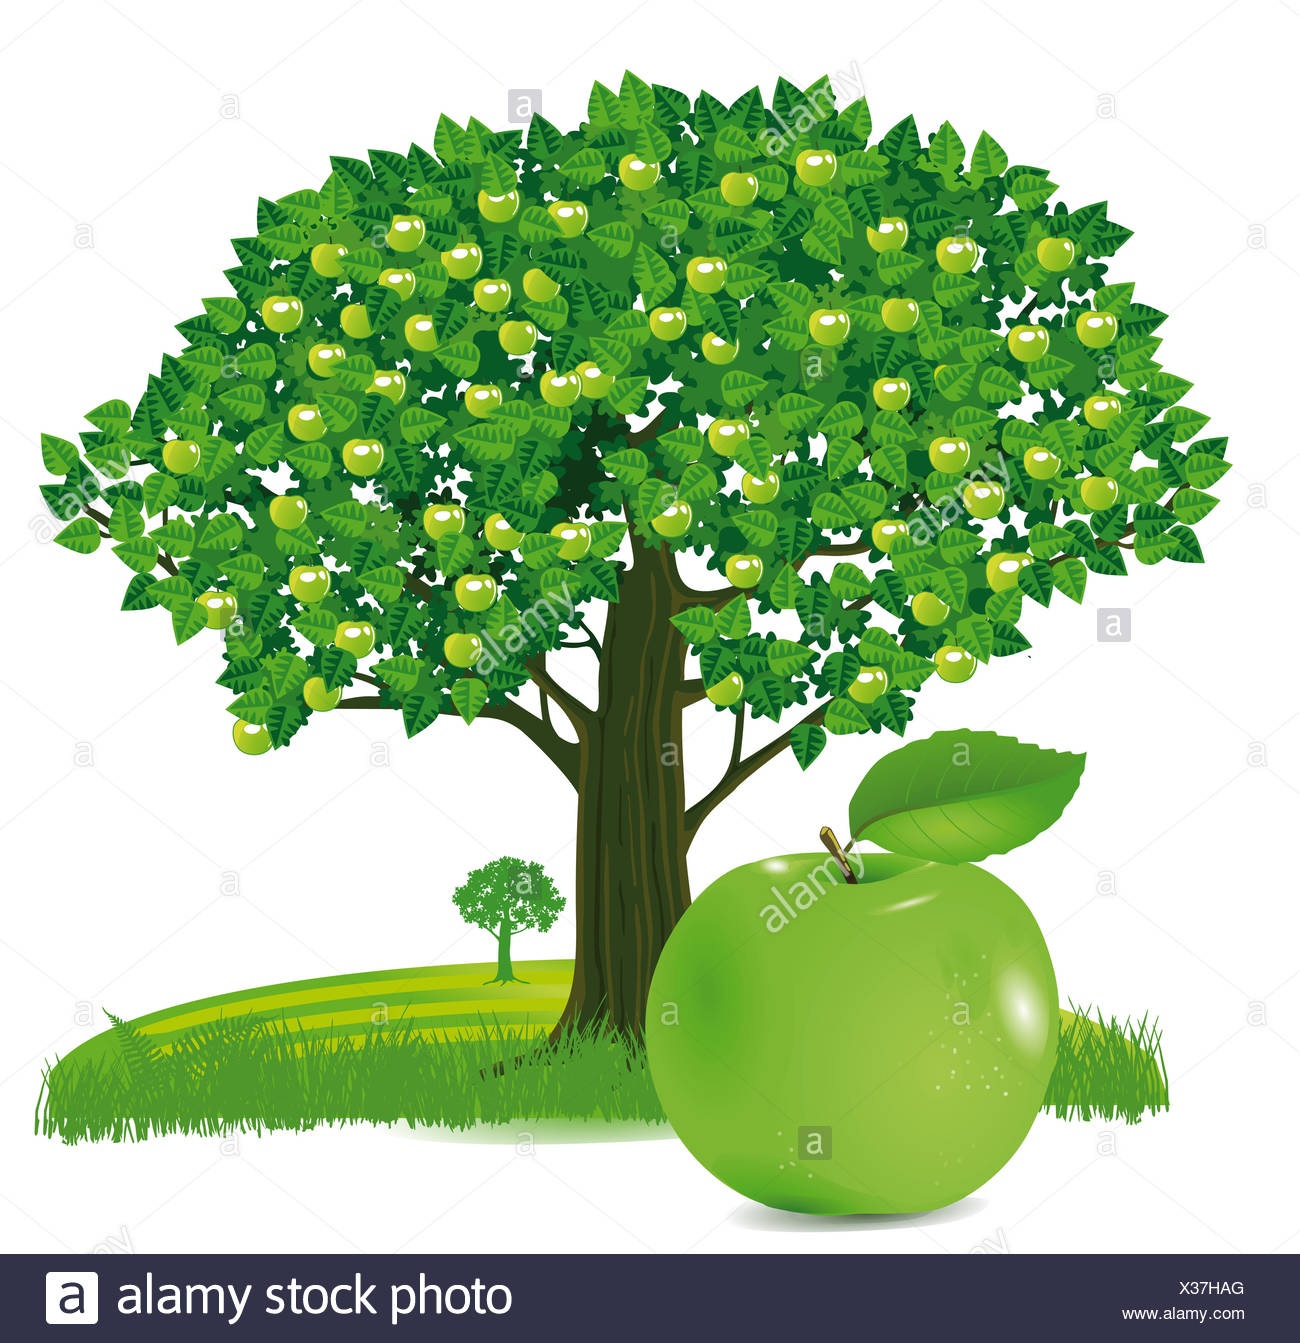 Apple with apple tree - Stock Image